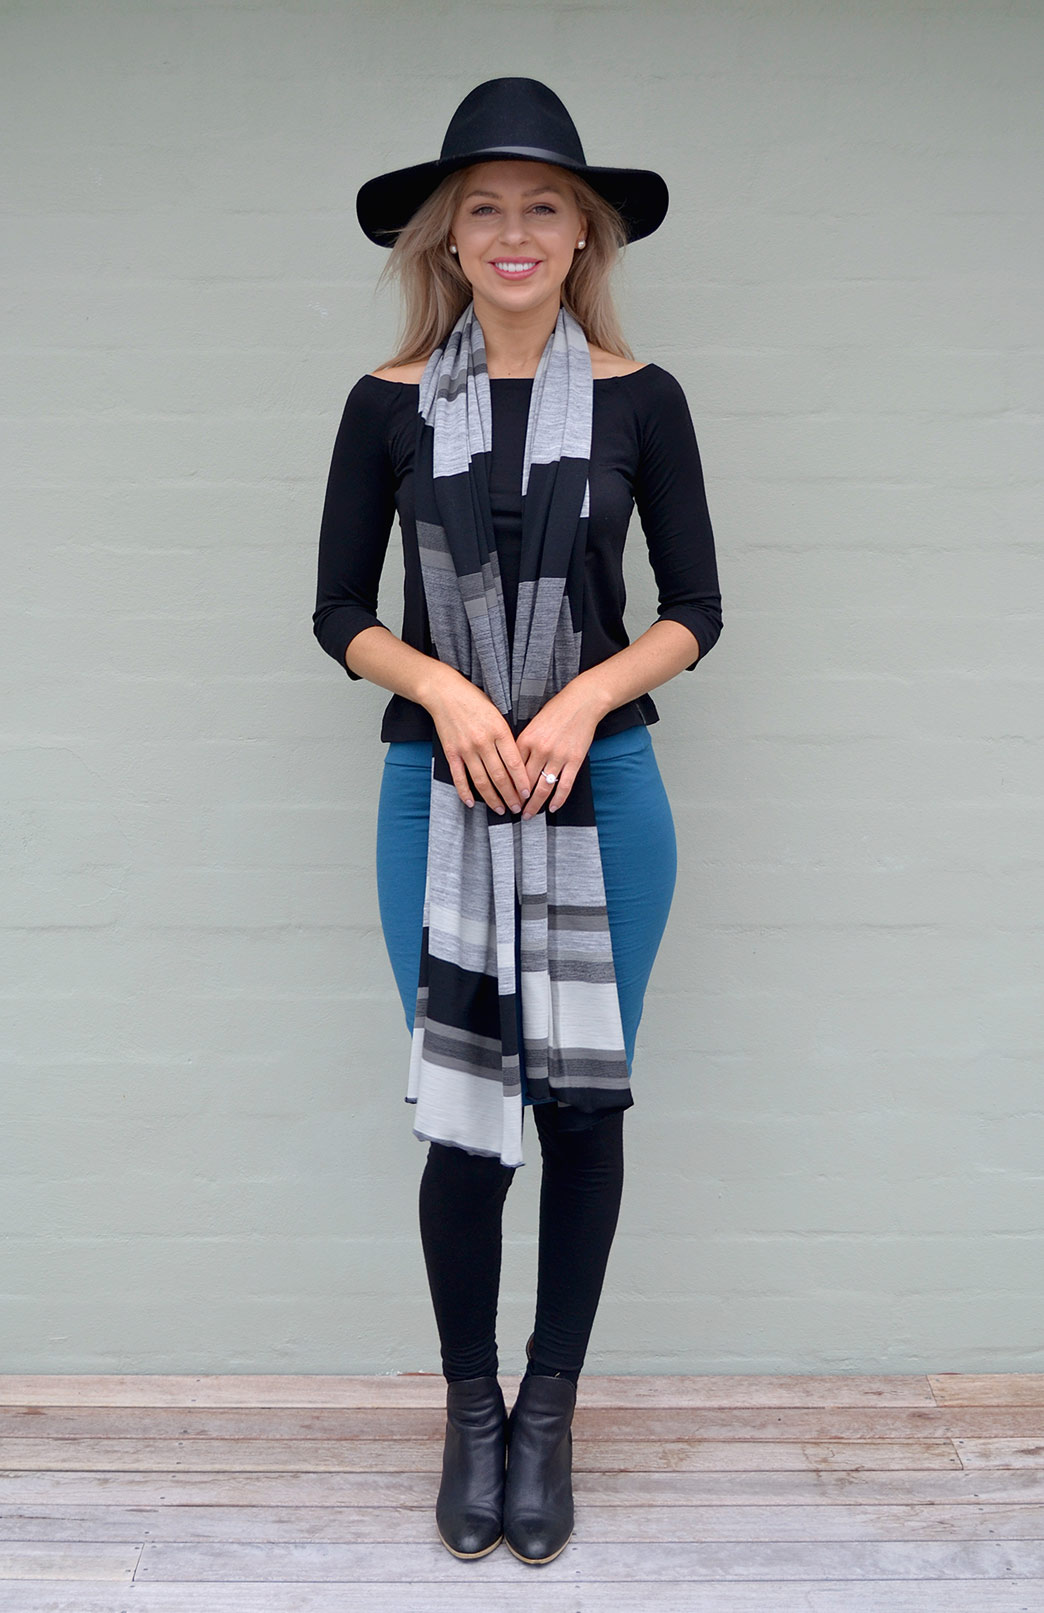 8404-wide-merino-scarf-black-multi-new-0.jpg